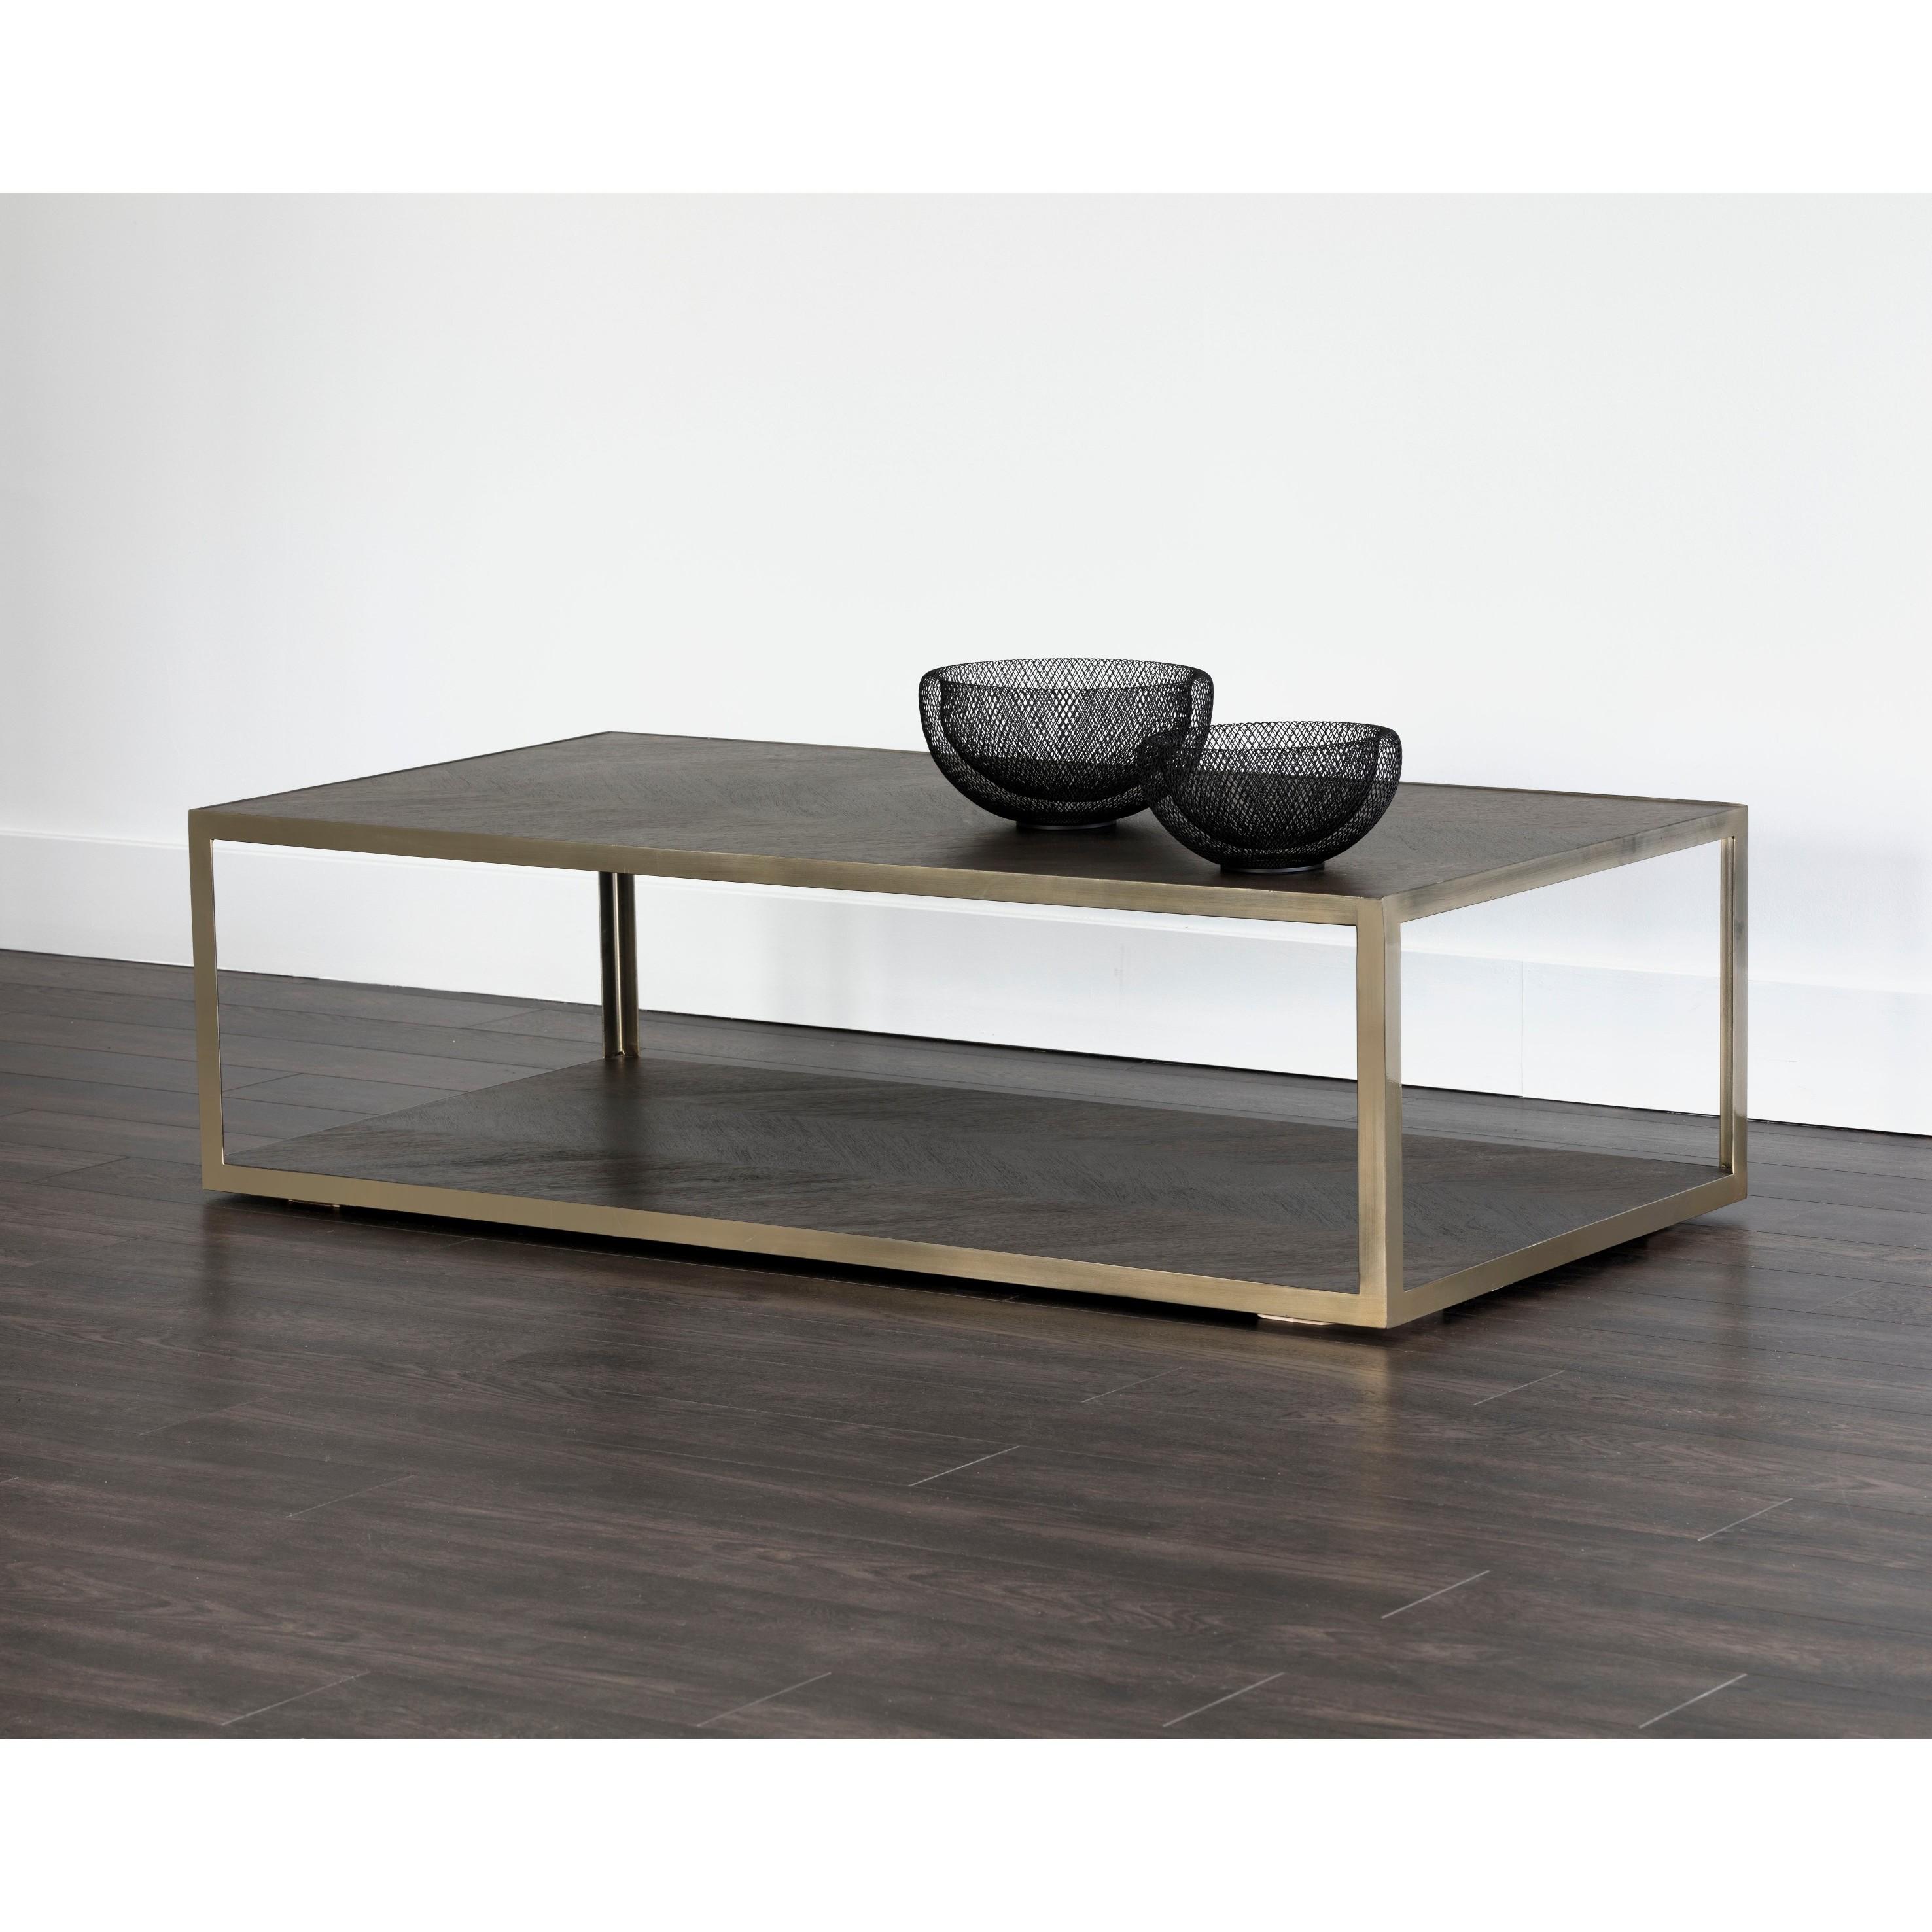 Sunpan Zenn Mara Smoked Mocha Wood Steel Coffee Table